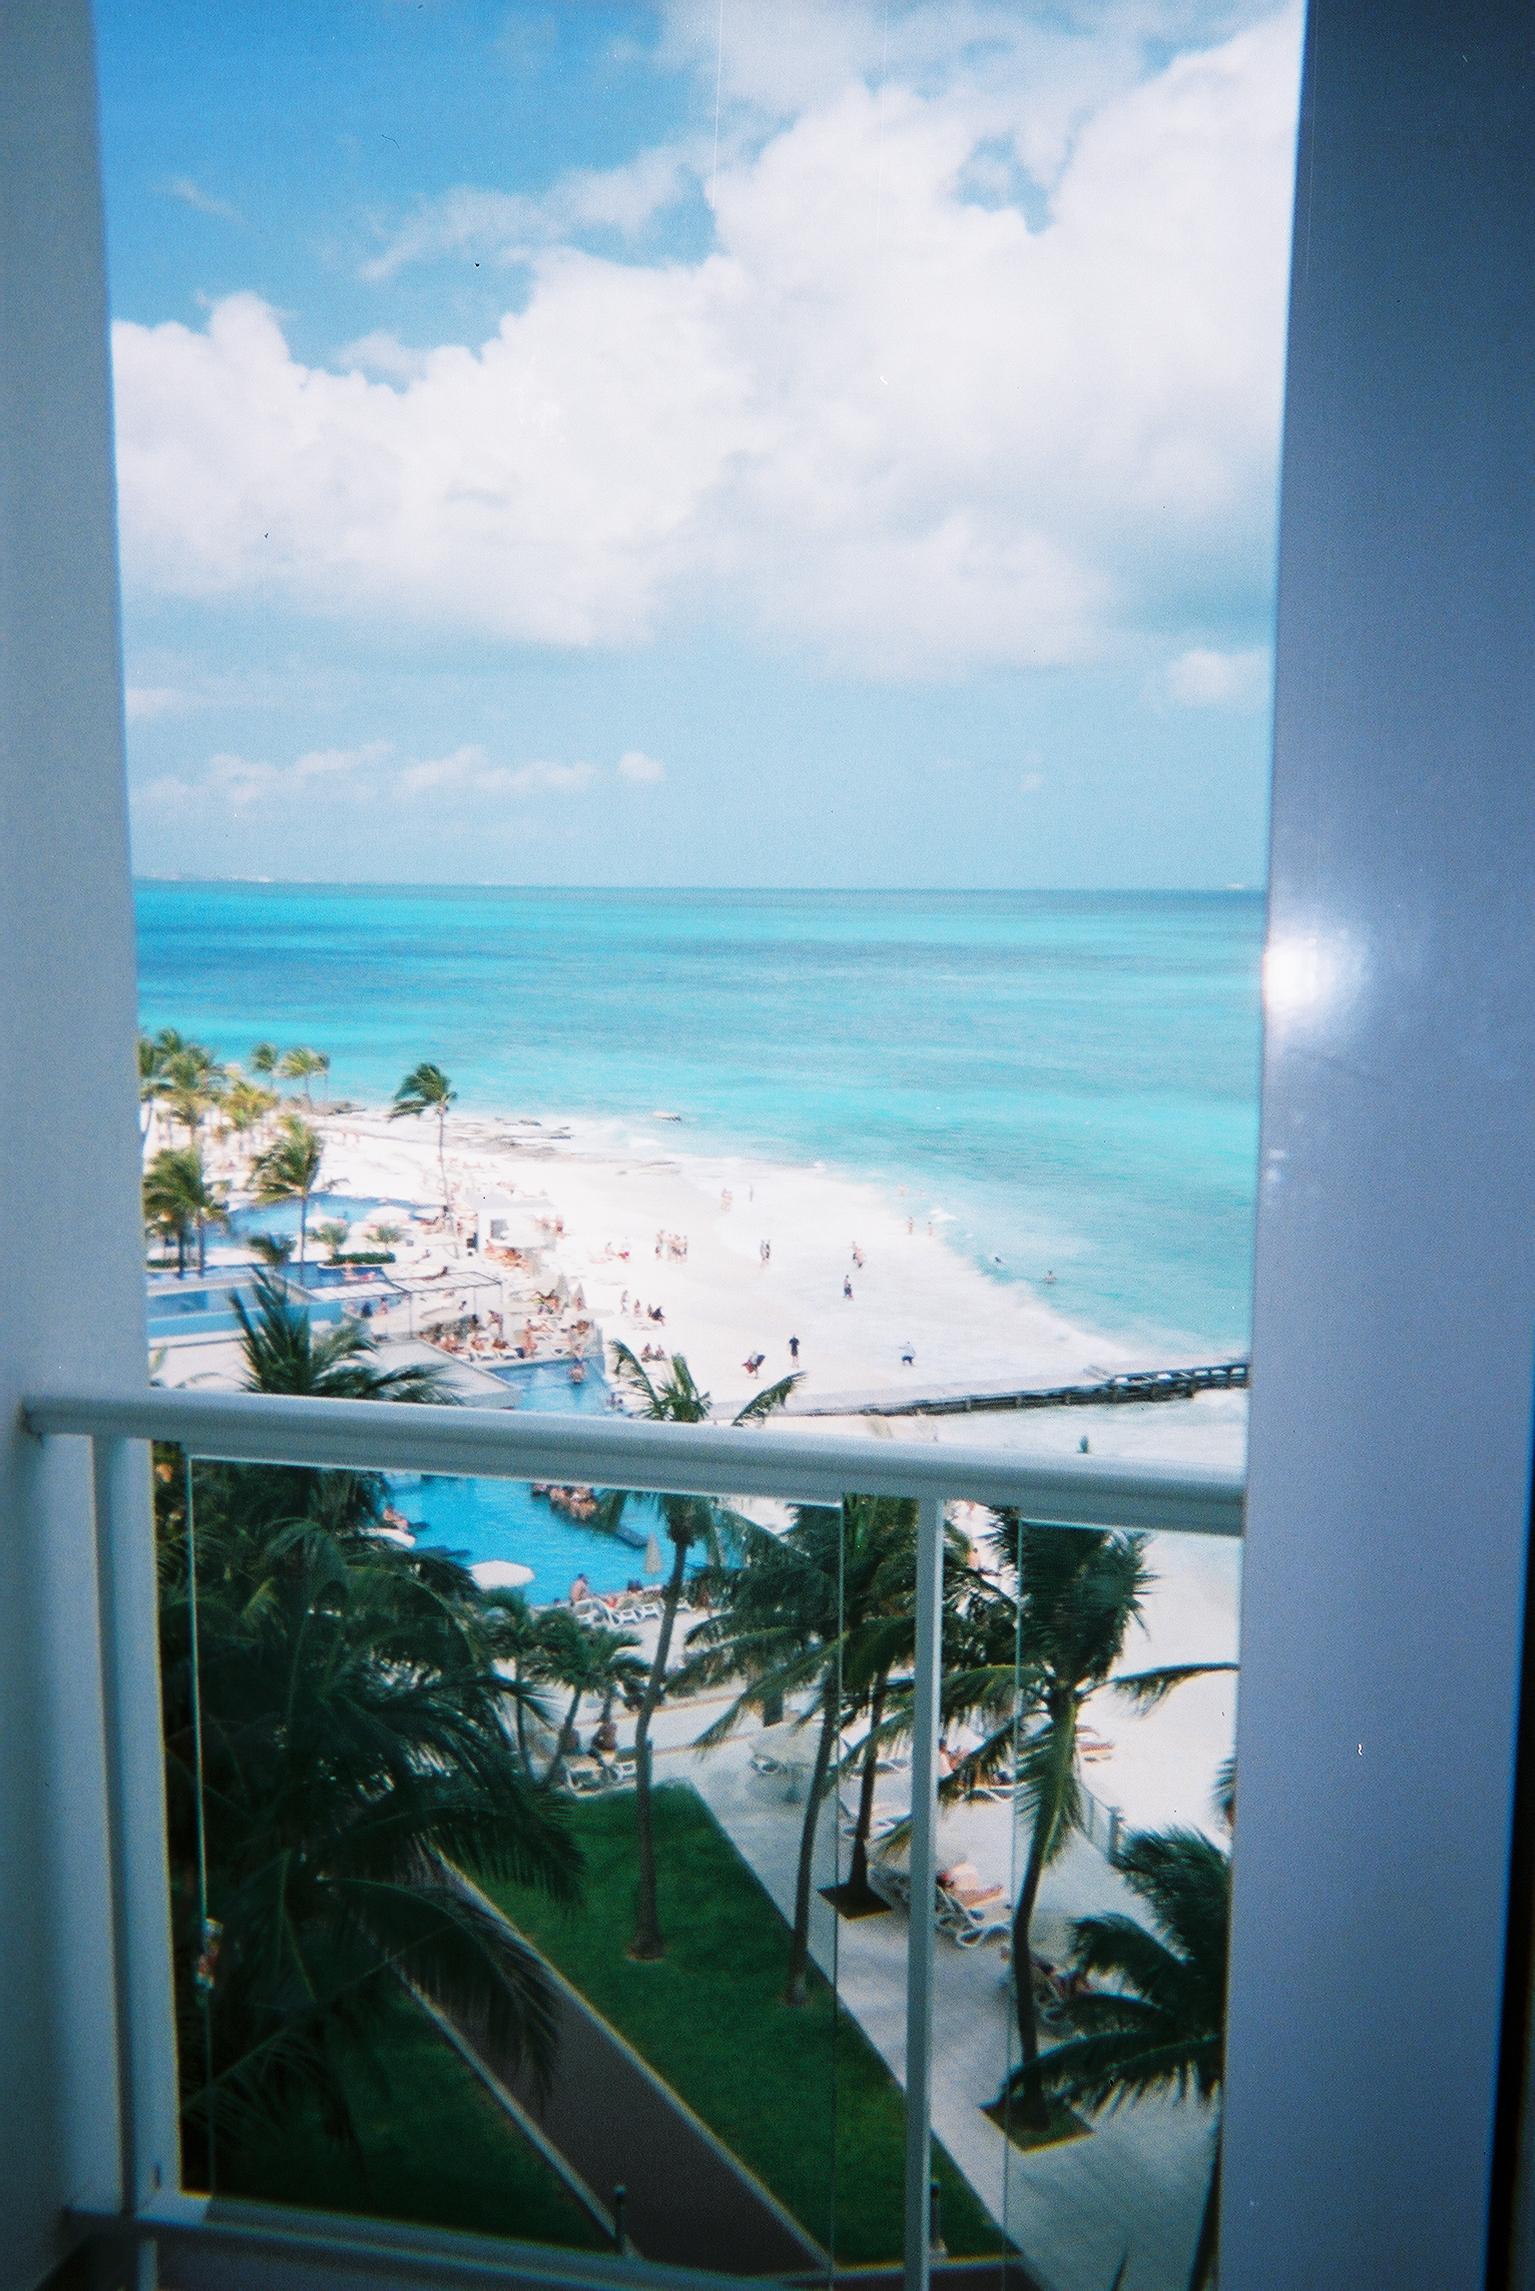 Hotelroom views